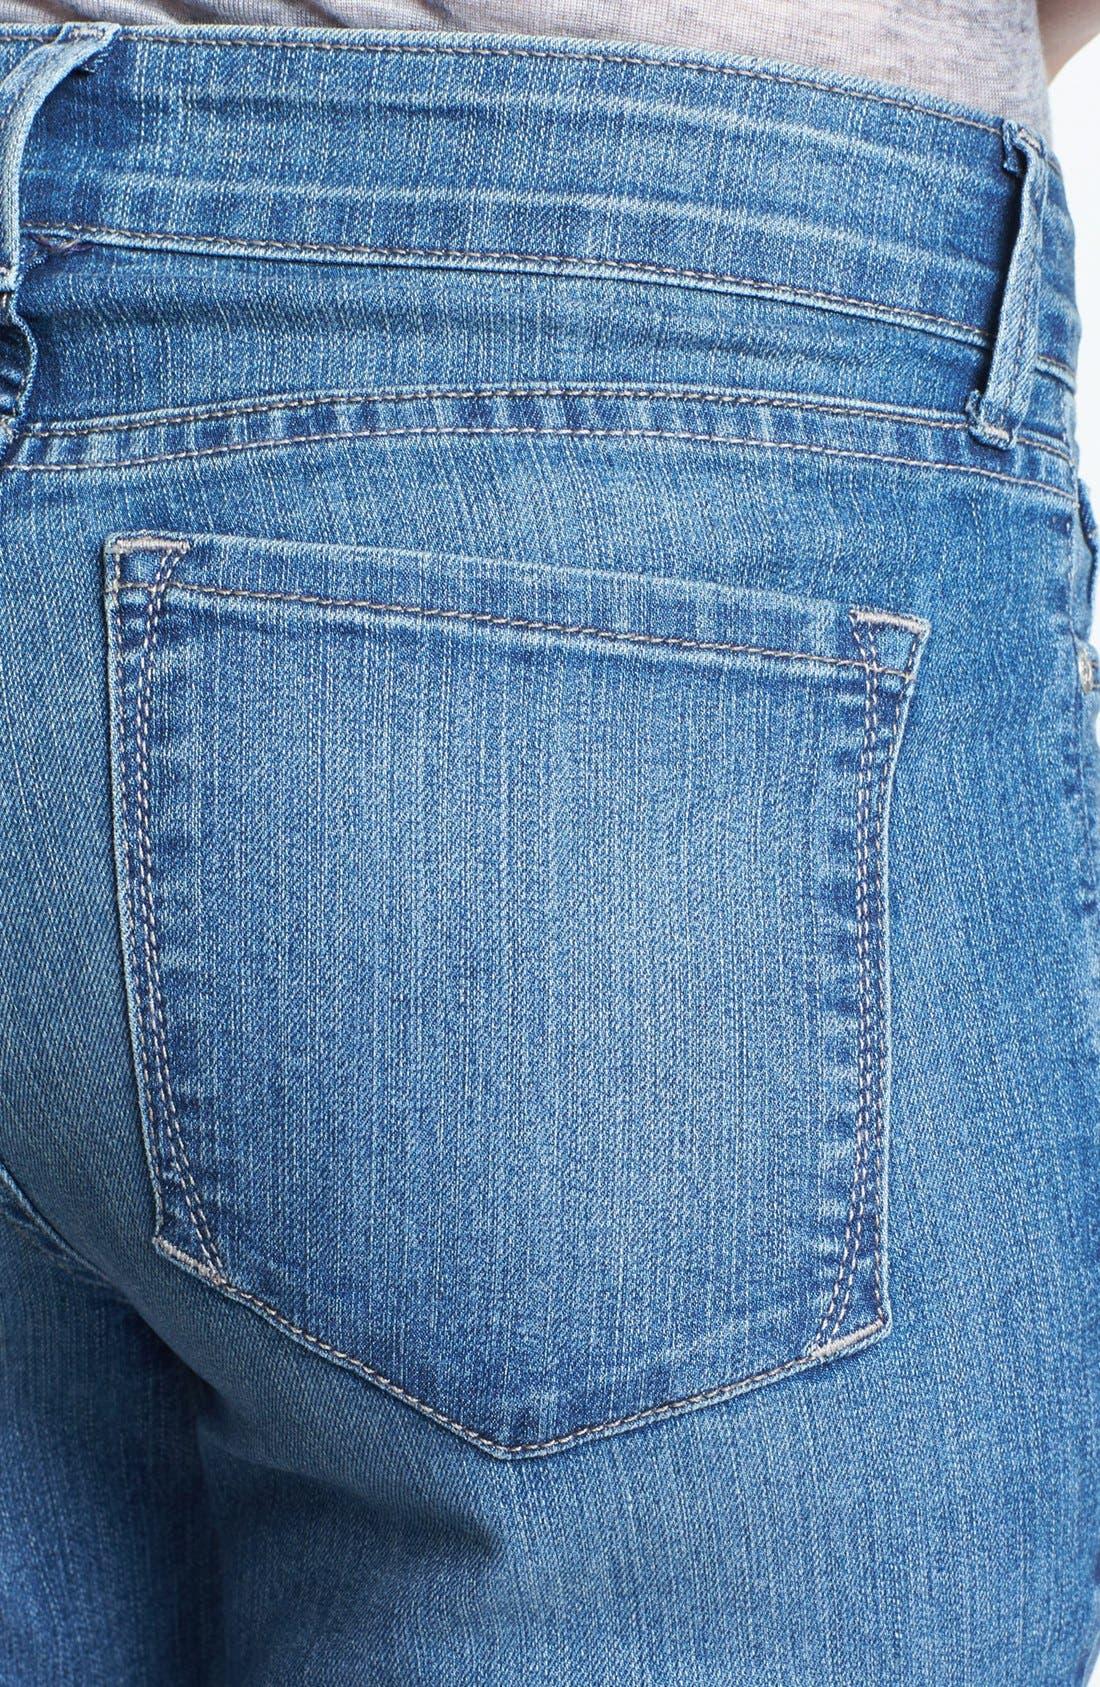 Alternate Image 3  - NYDJ 'Sheri' Stretch Skinny Jeans (Ontario) (Petite)